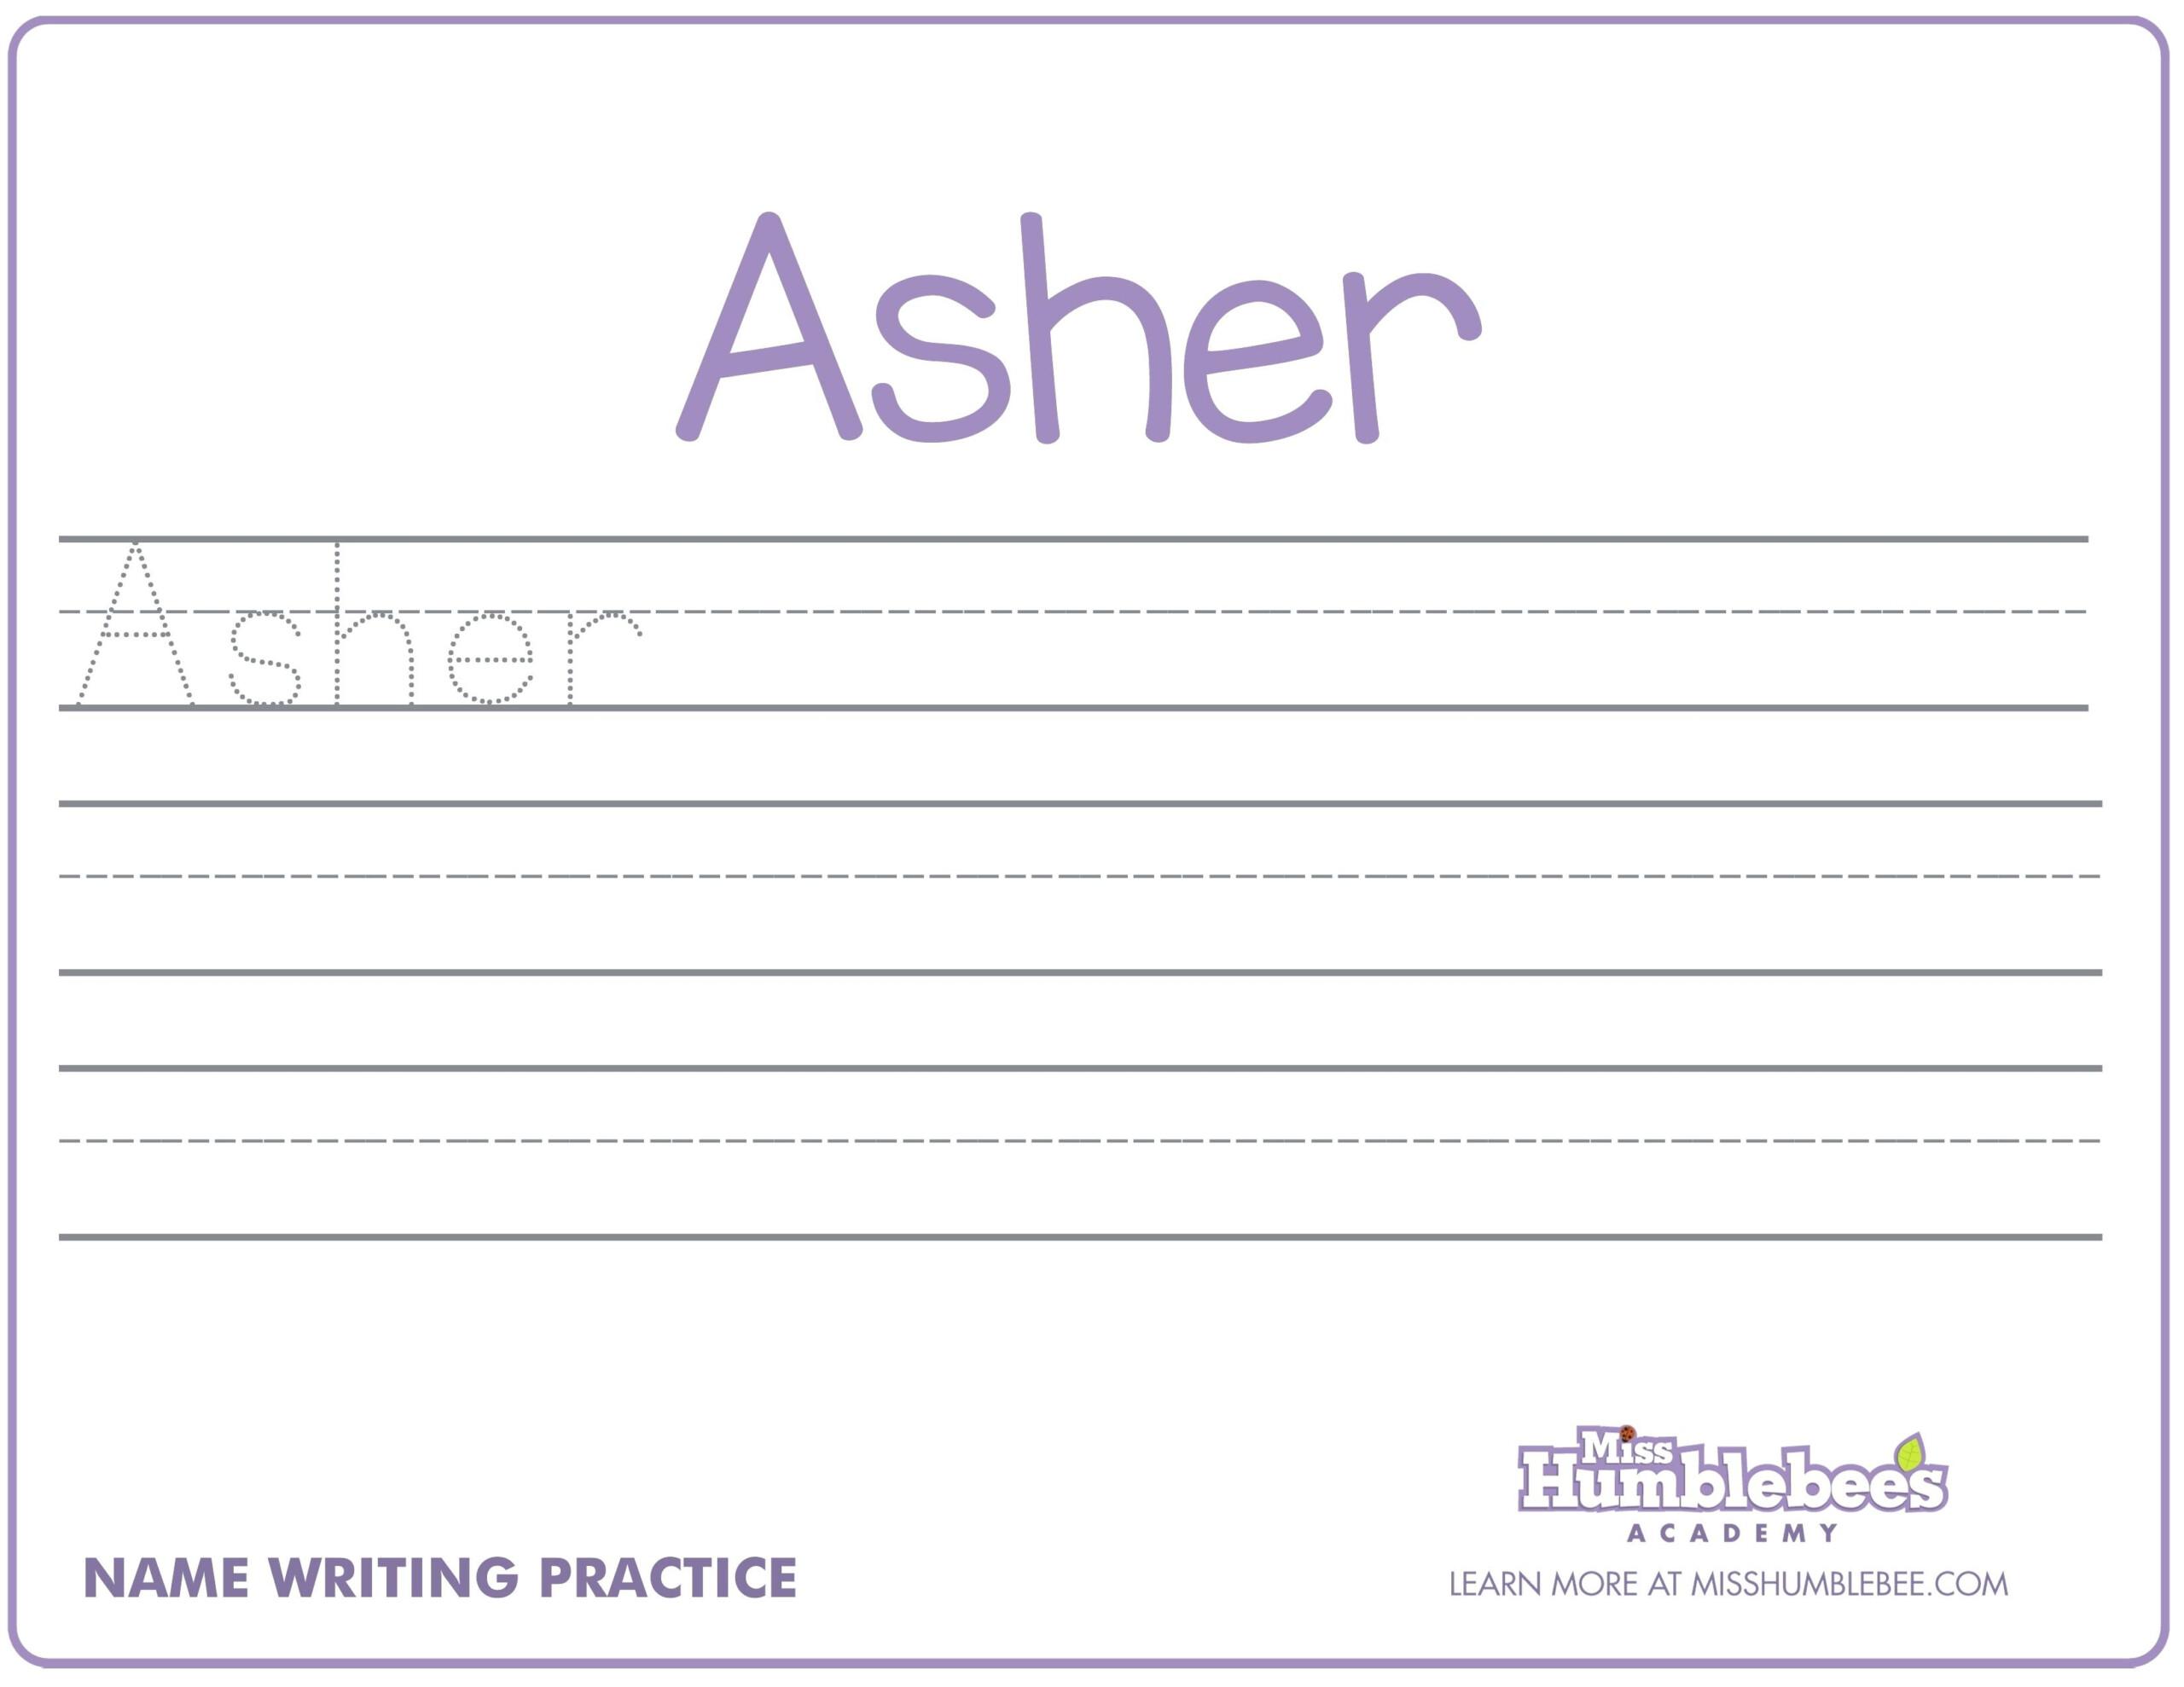 Name Handwriting Worksheets For Print. Name Handwriting